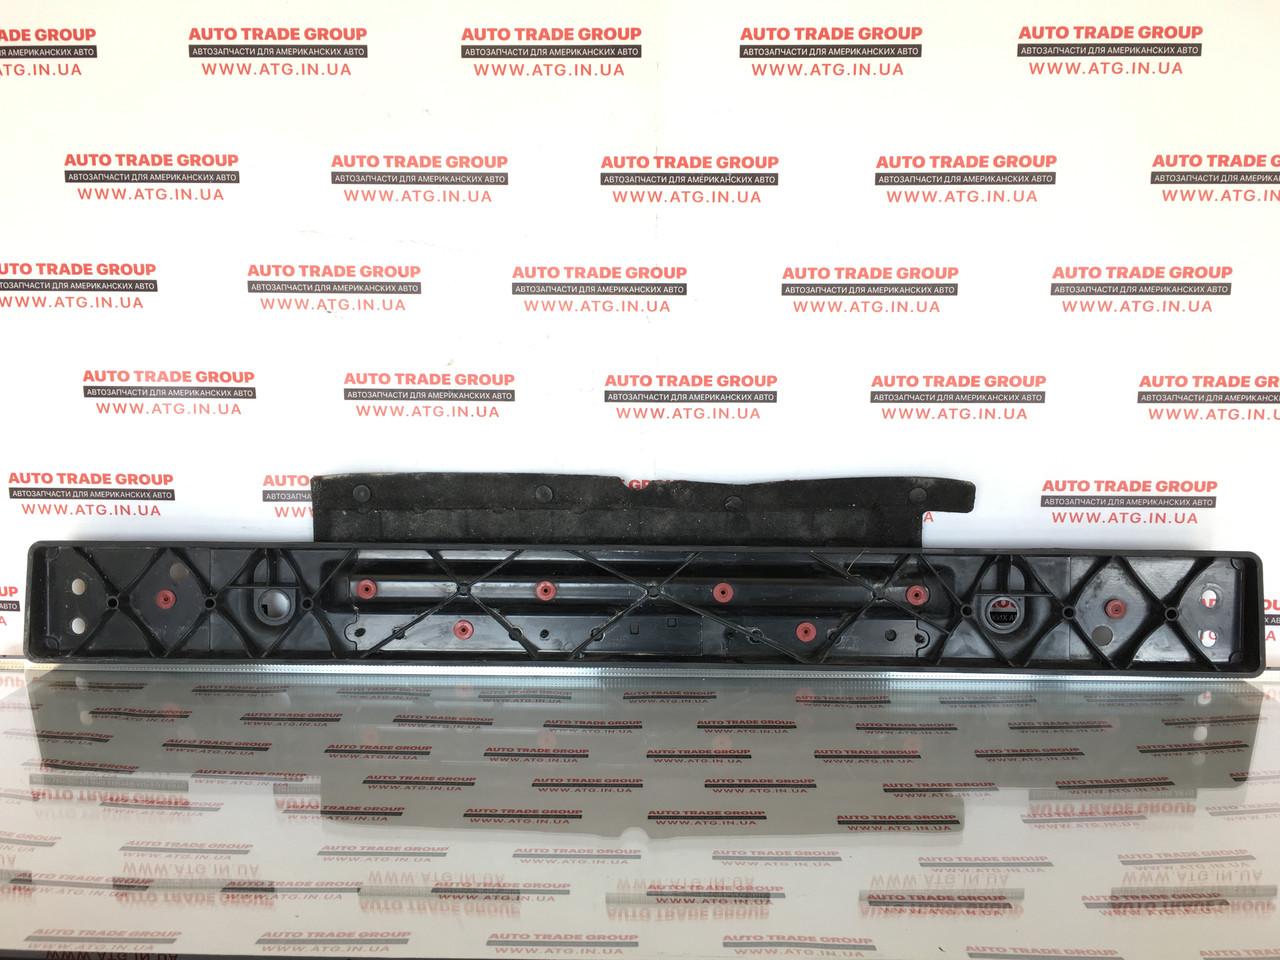 Панель передняя нижняя под радиатор Ford Fusion 2013-2016 DS7Z16138B